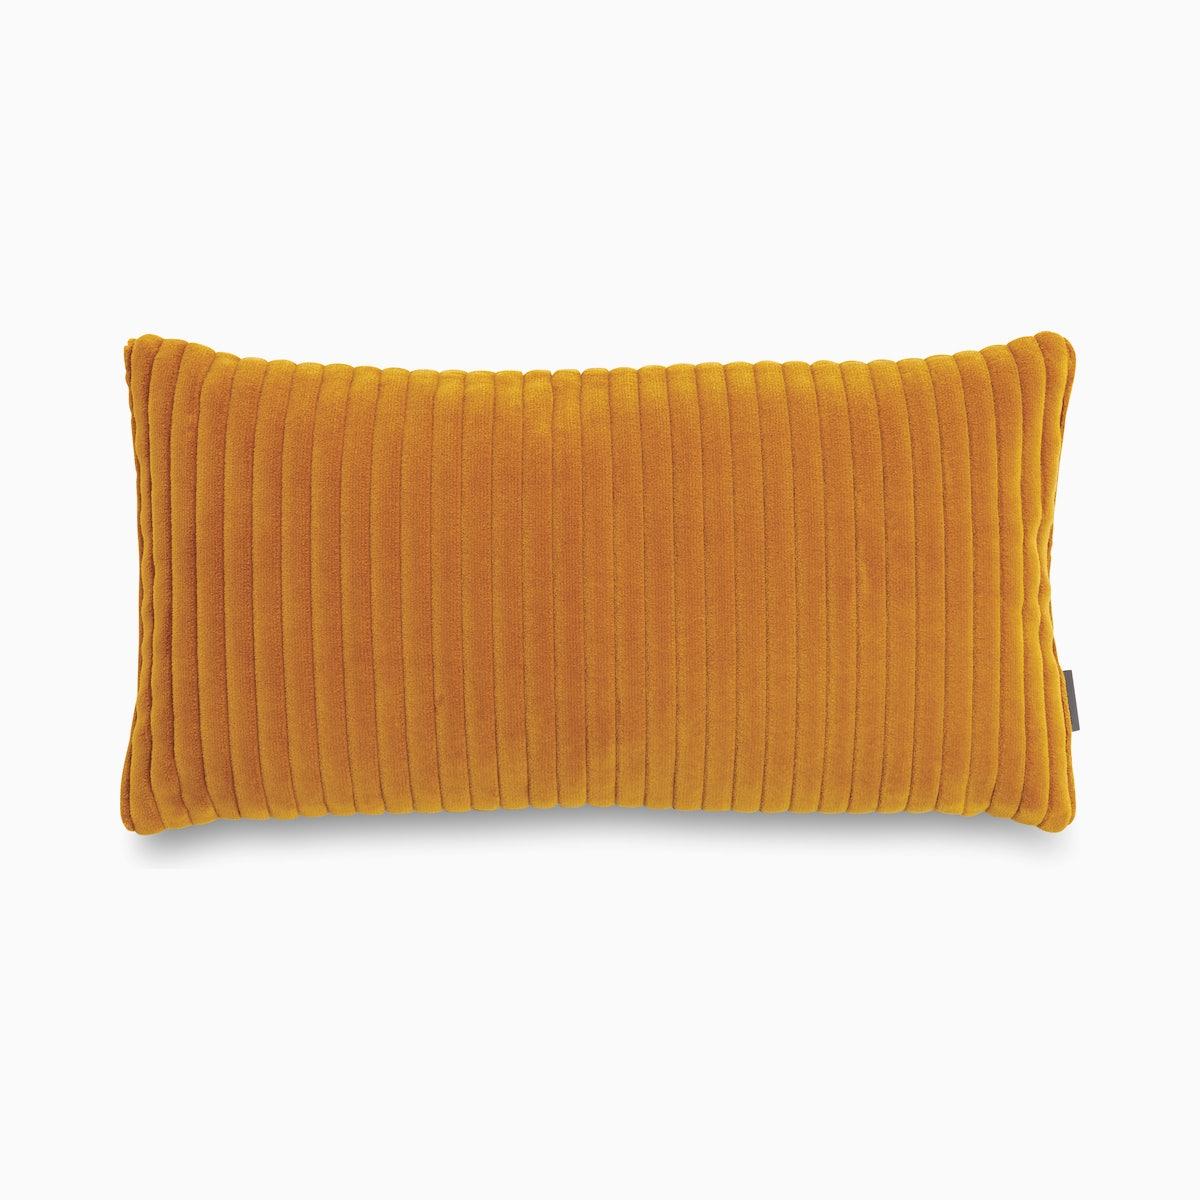 Wide Corduroy Pillow